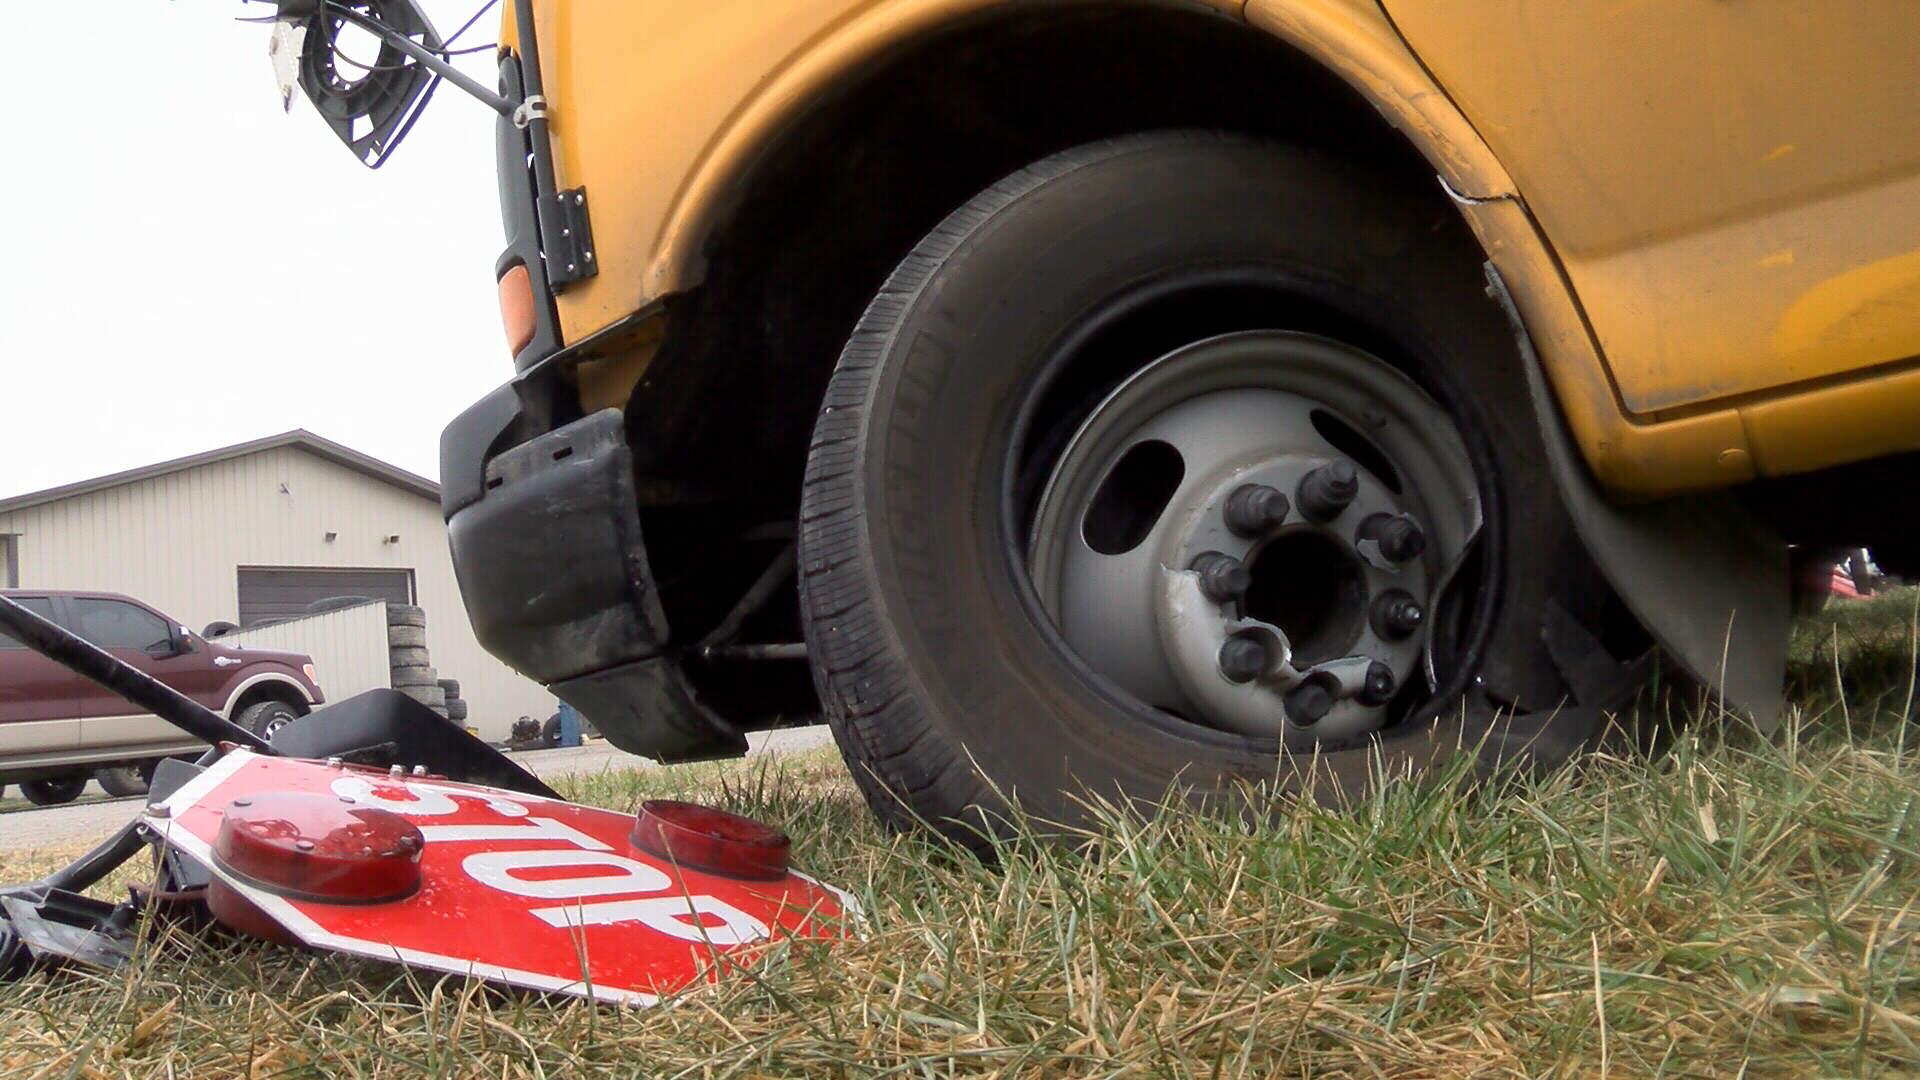 Damaged school bus